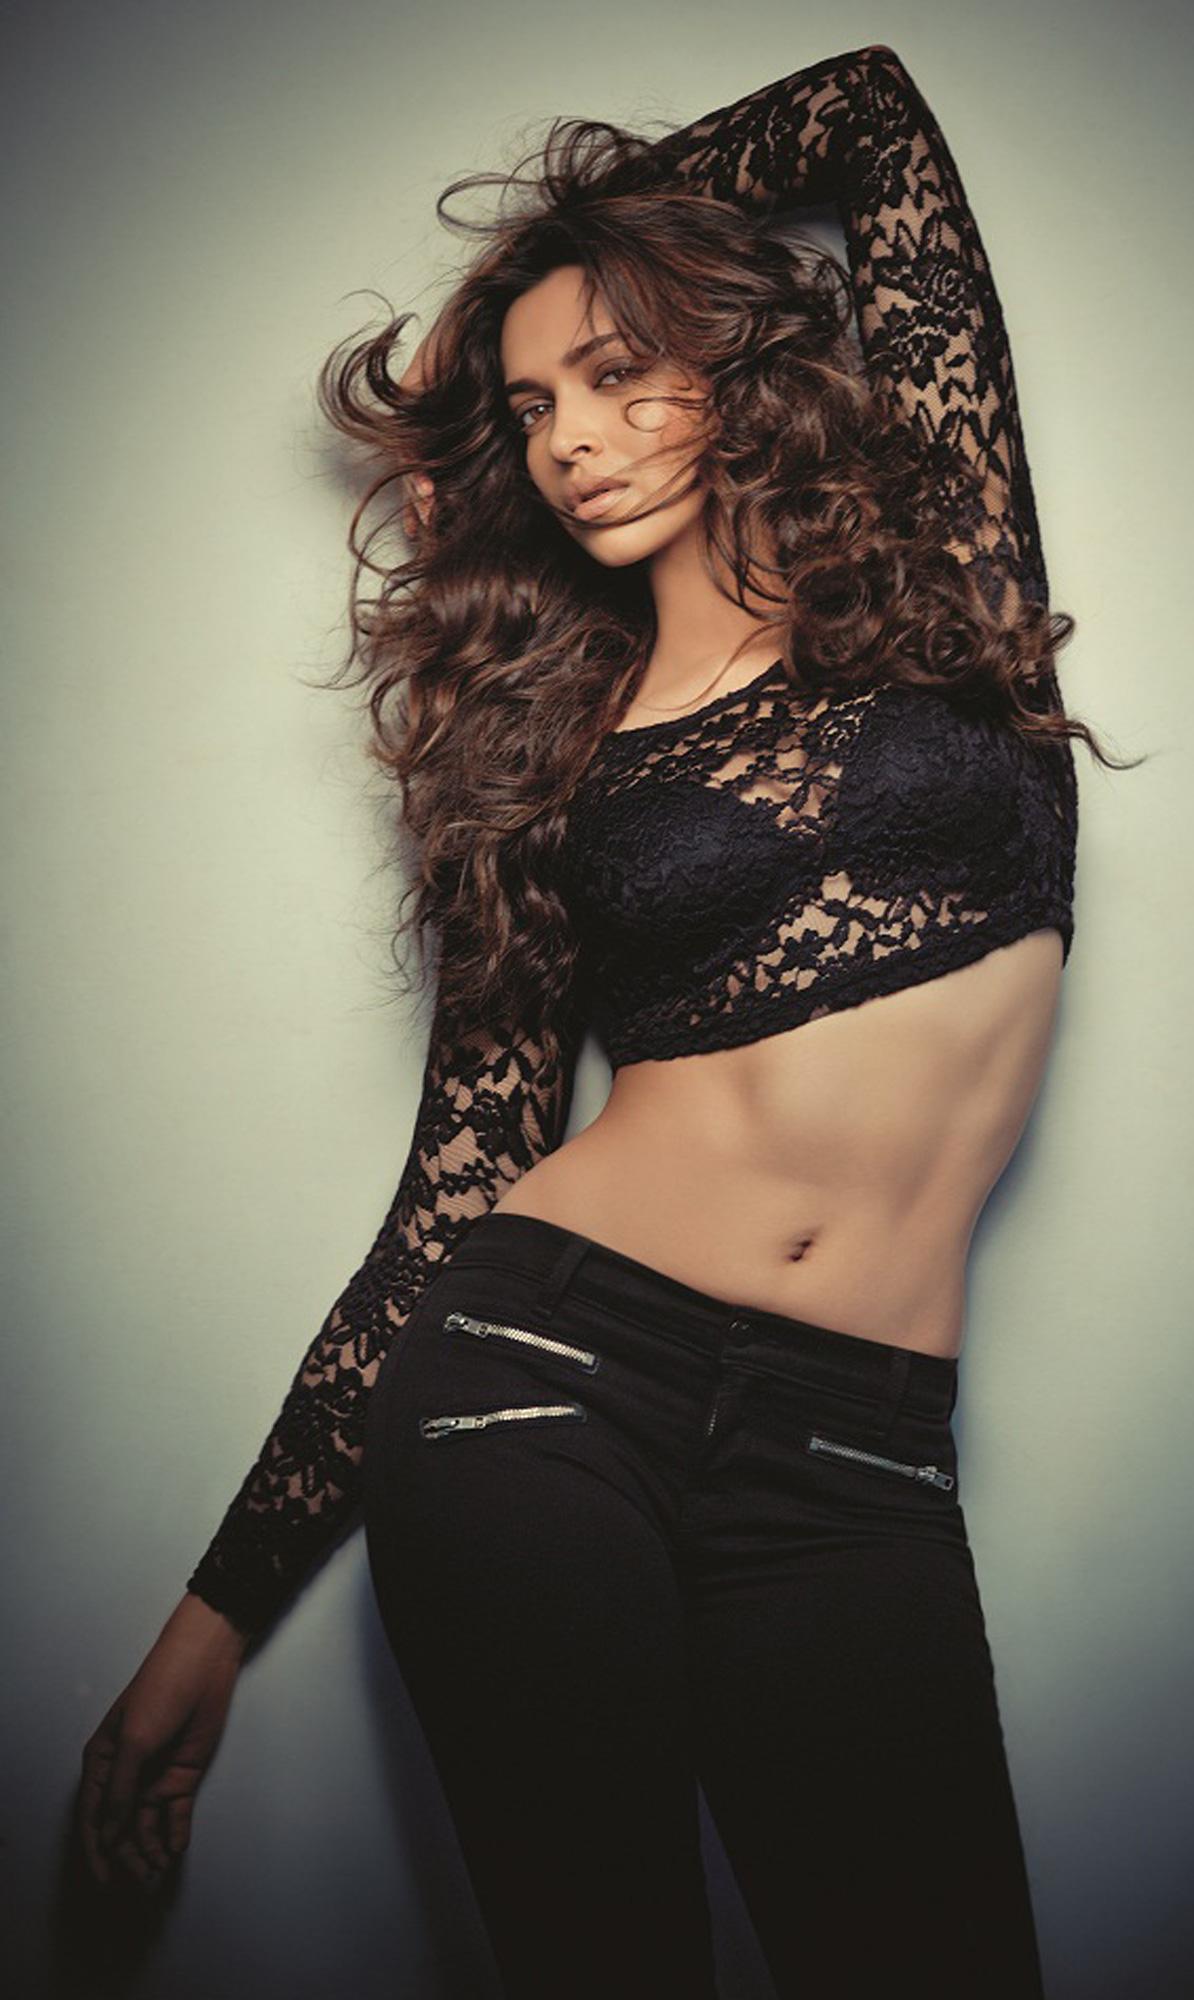 Transparent  Hotness Of Bollywood-3458